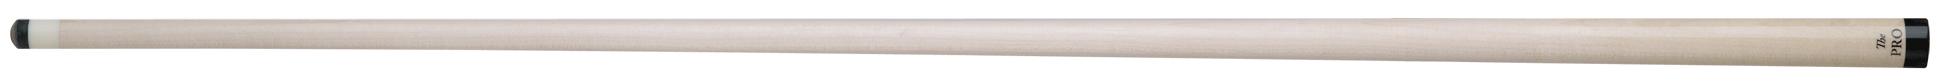 11300P-Meucci-shaft-the-pro